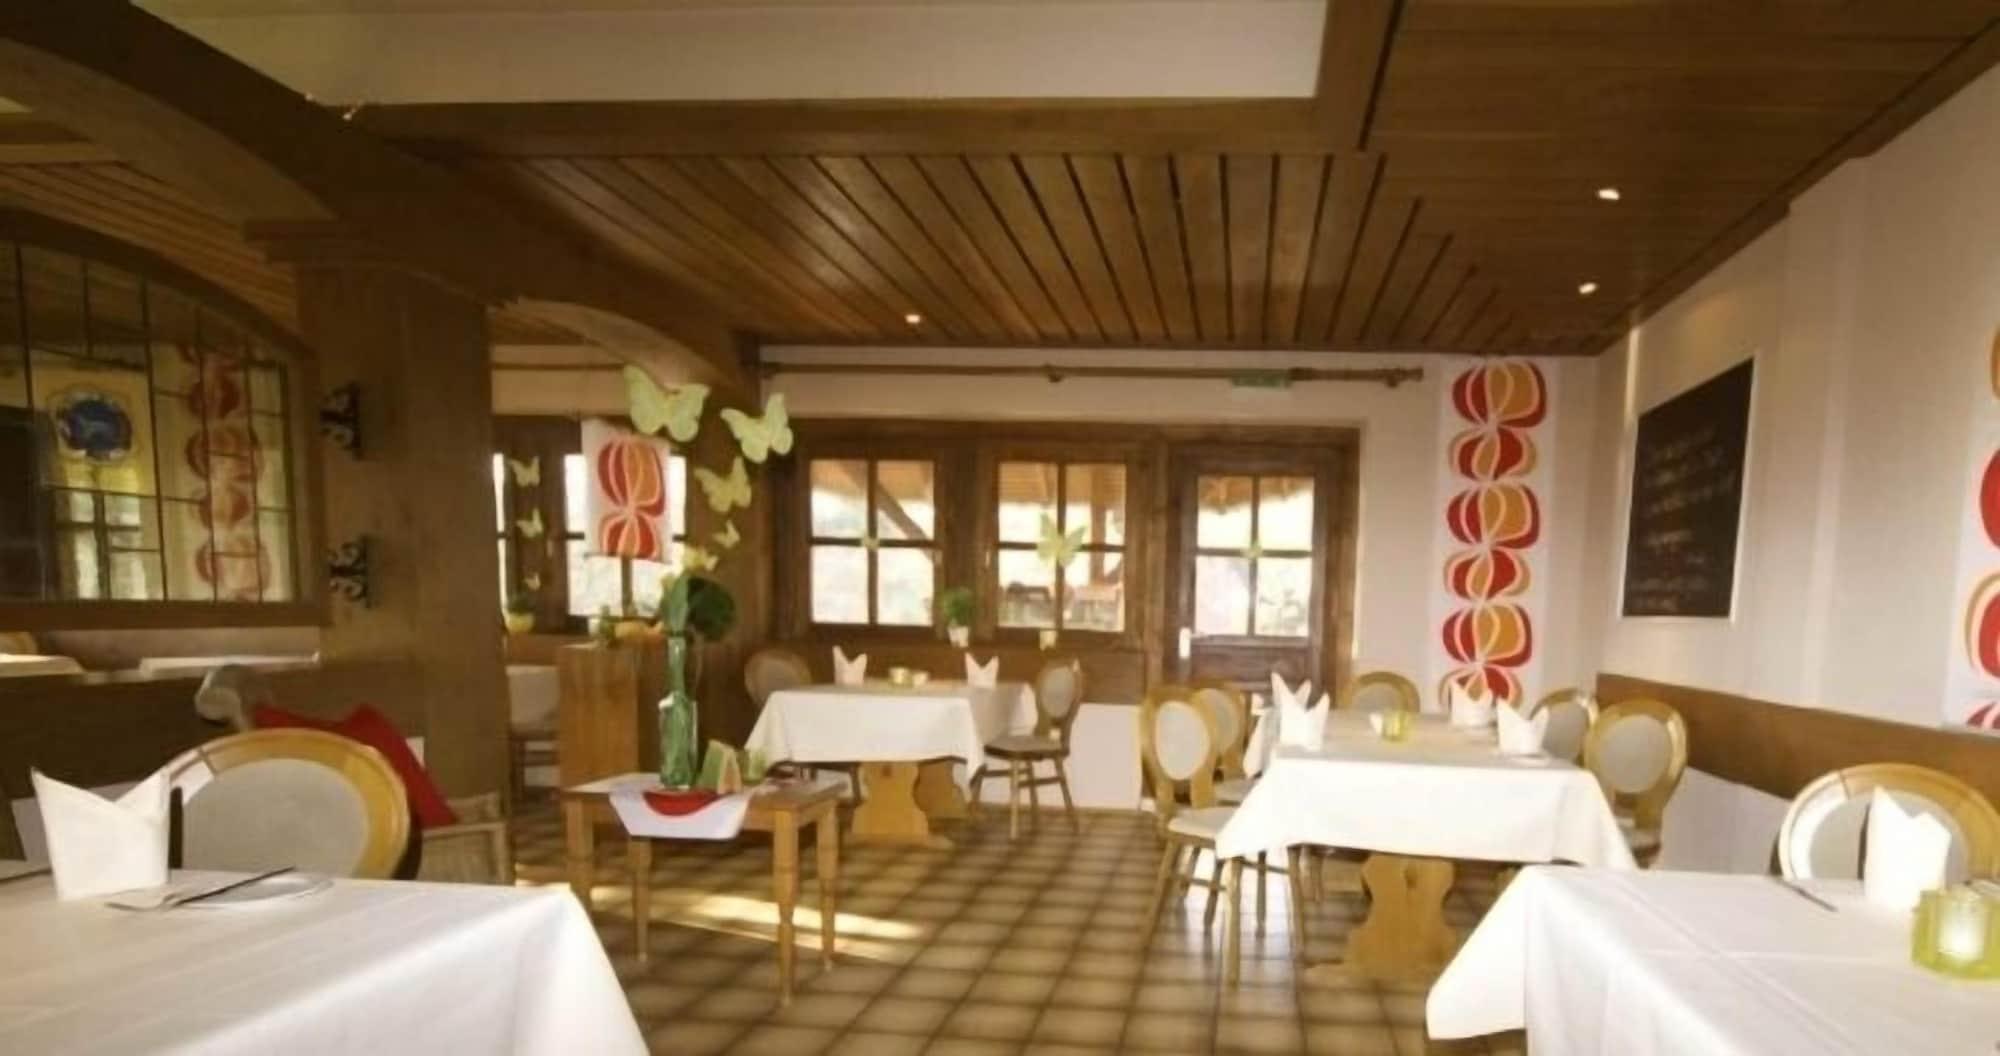 Hotel Reweschnier, Kusel